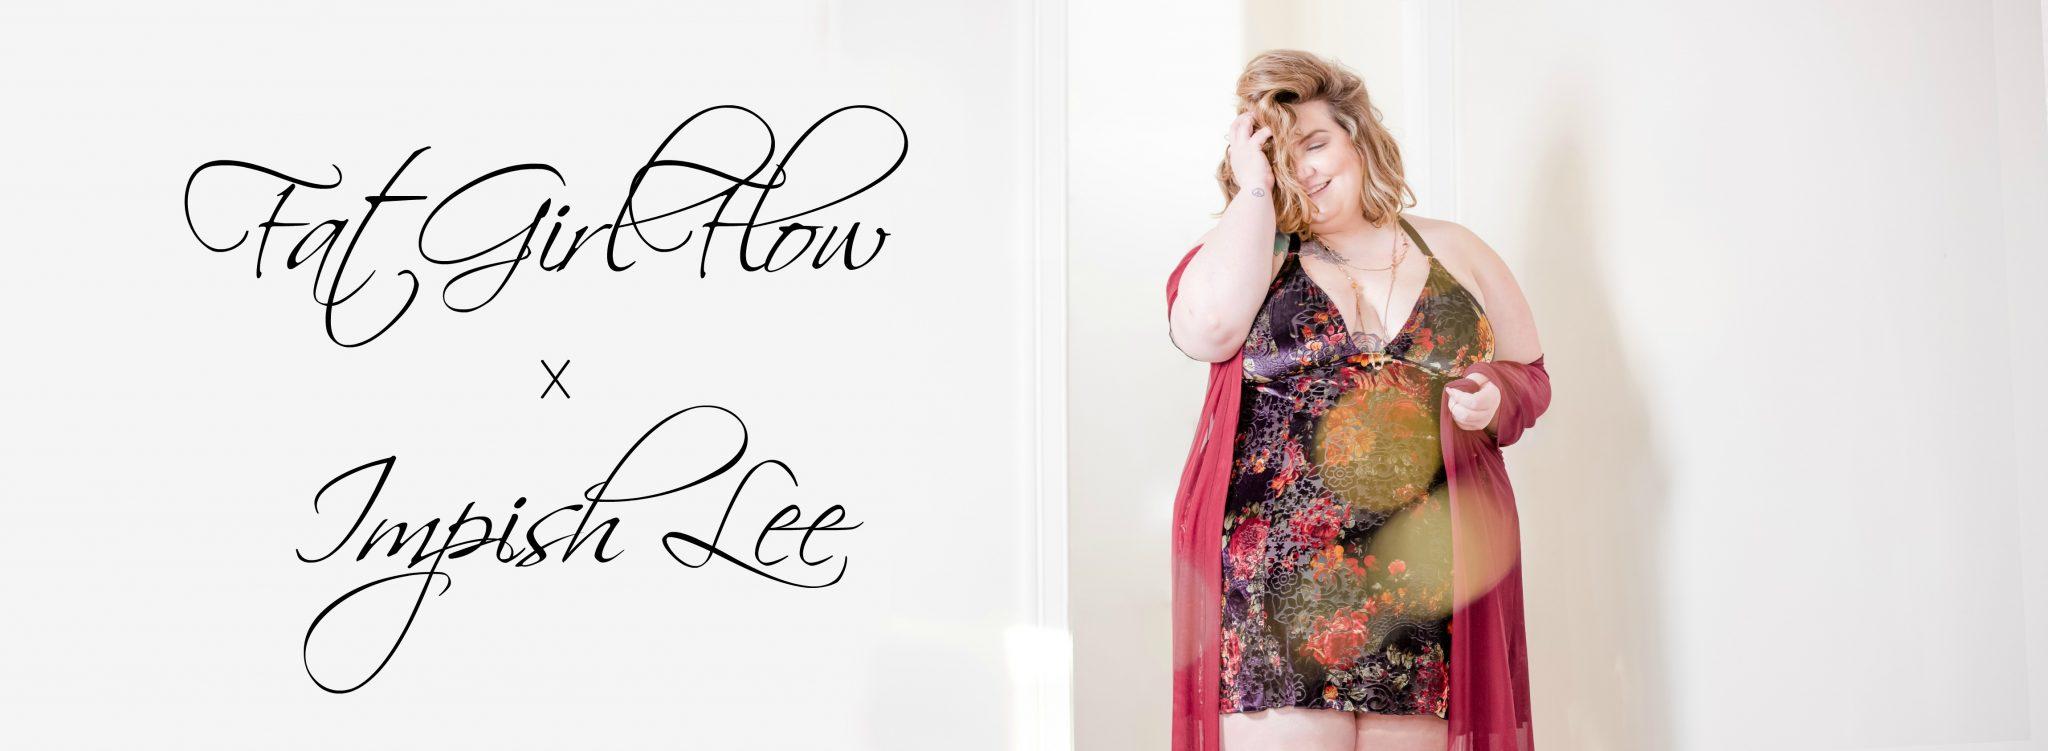 Impish Lee - Fat-girl-flow